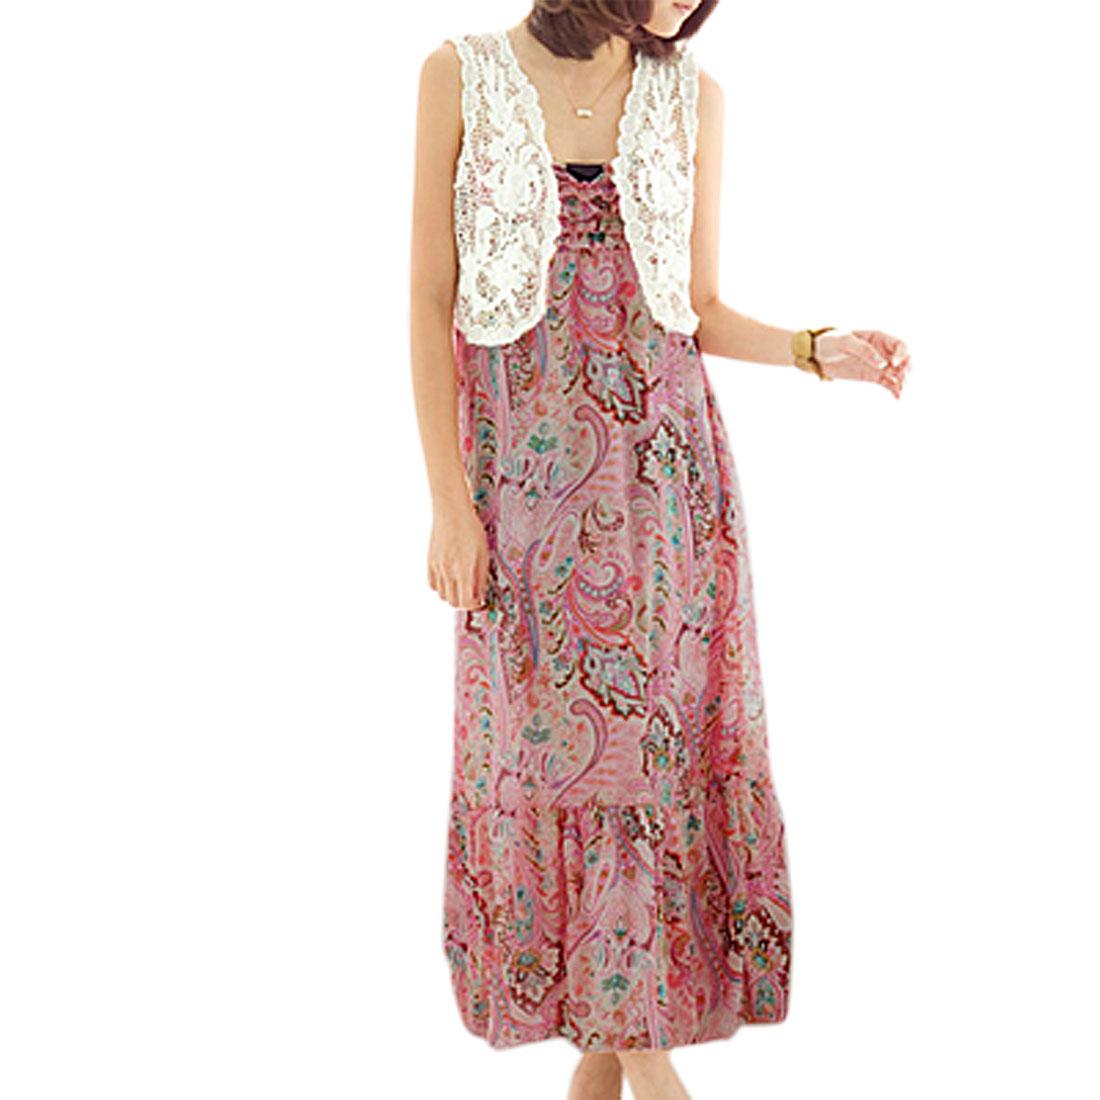 Flower Ruched Crossover V Neck Chiffon Slip Dress for Ladies XS